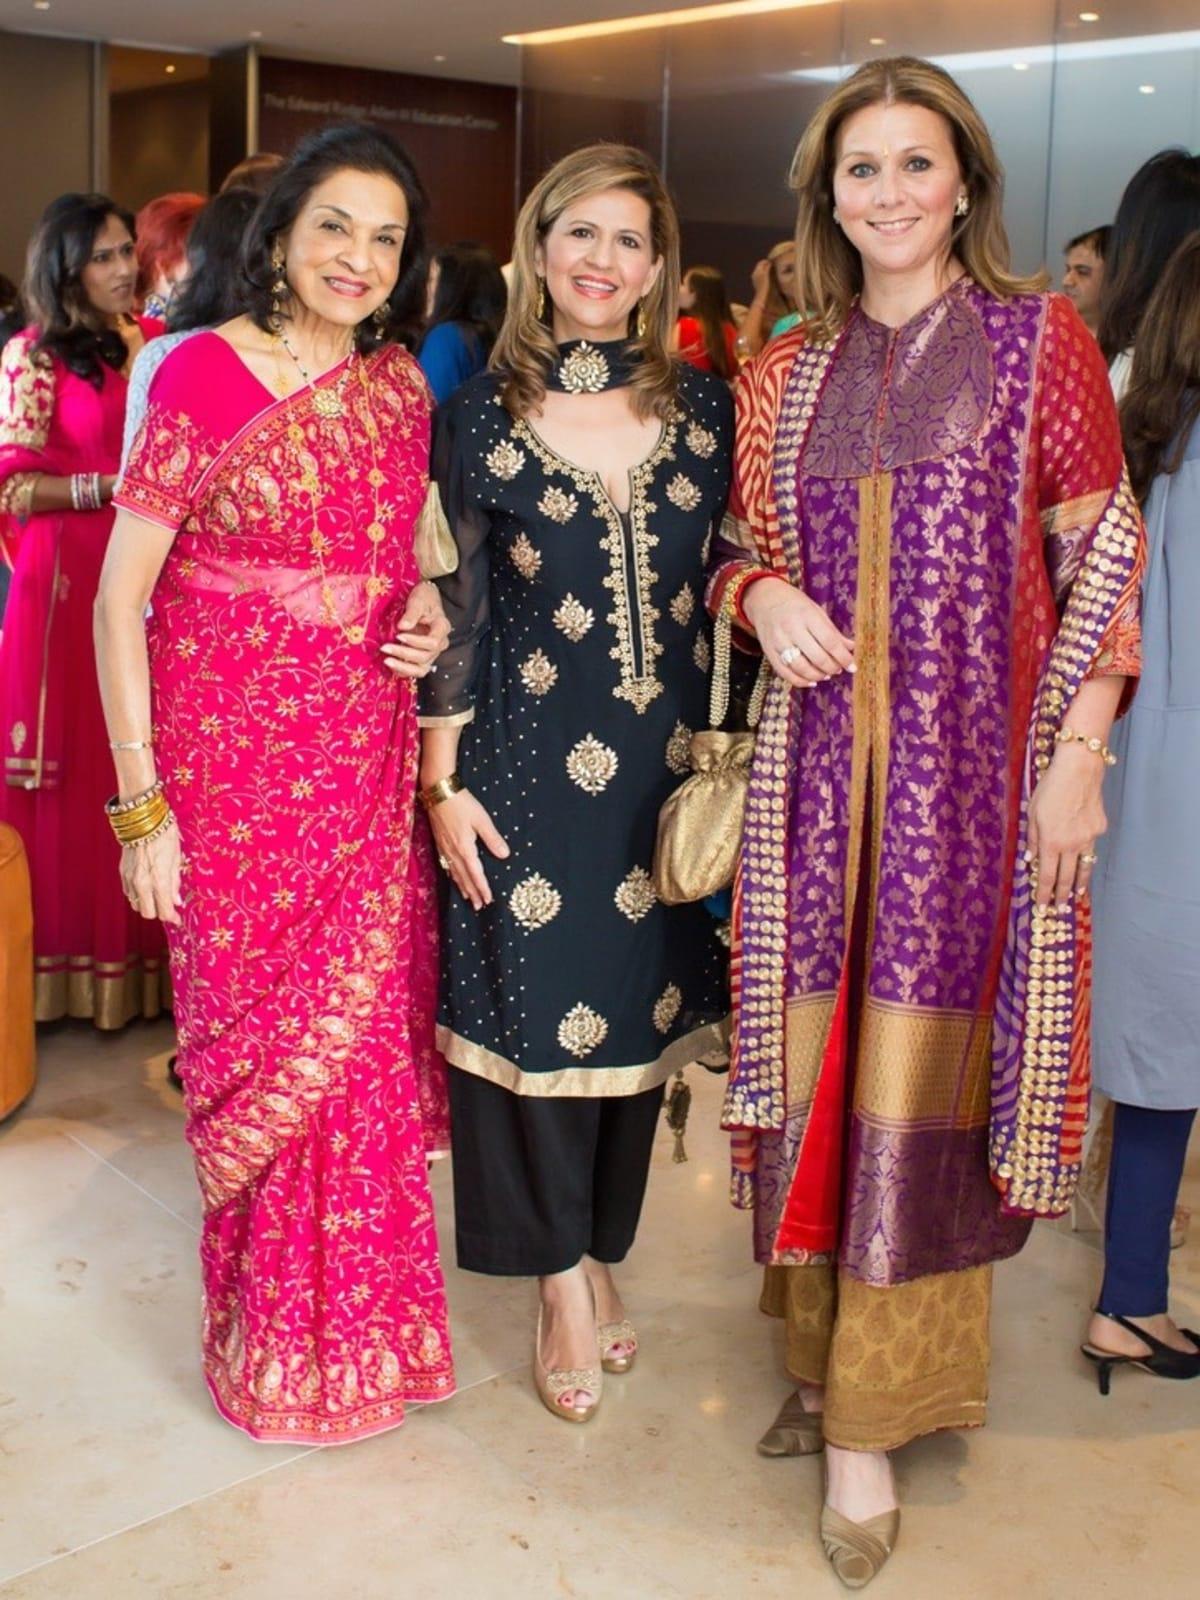 Monjula Chidambaram, Mehrnaz Gill, Donatella Benckenstein at International Mother's Day Soiree